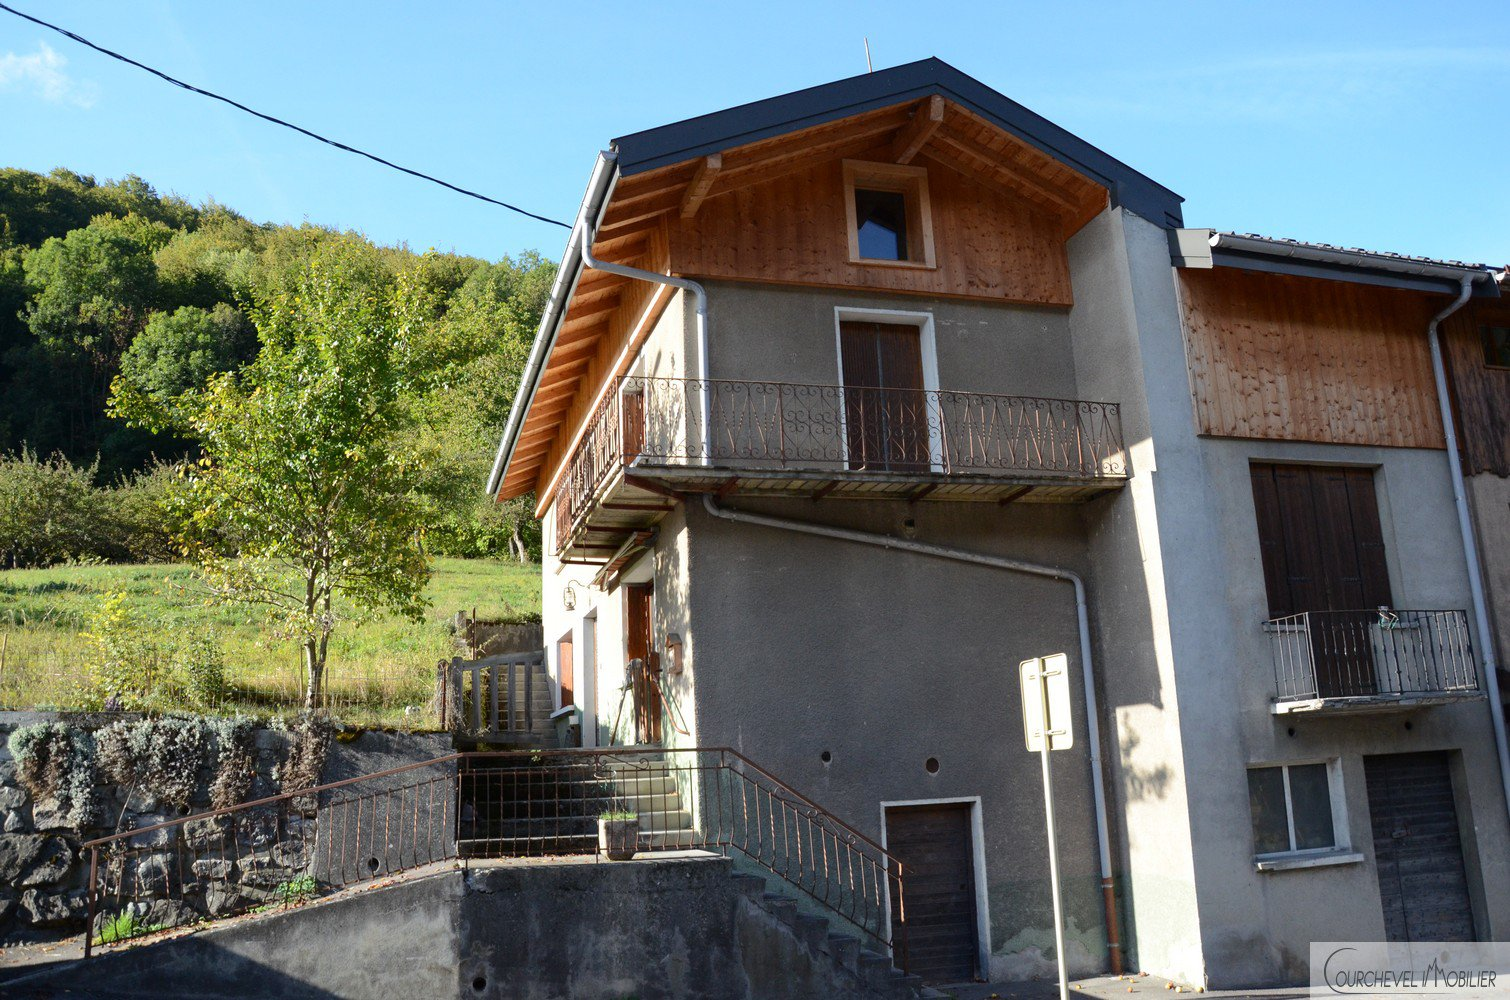 Verkoop Dorpshuis - Brides-les-Bains